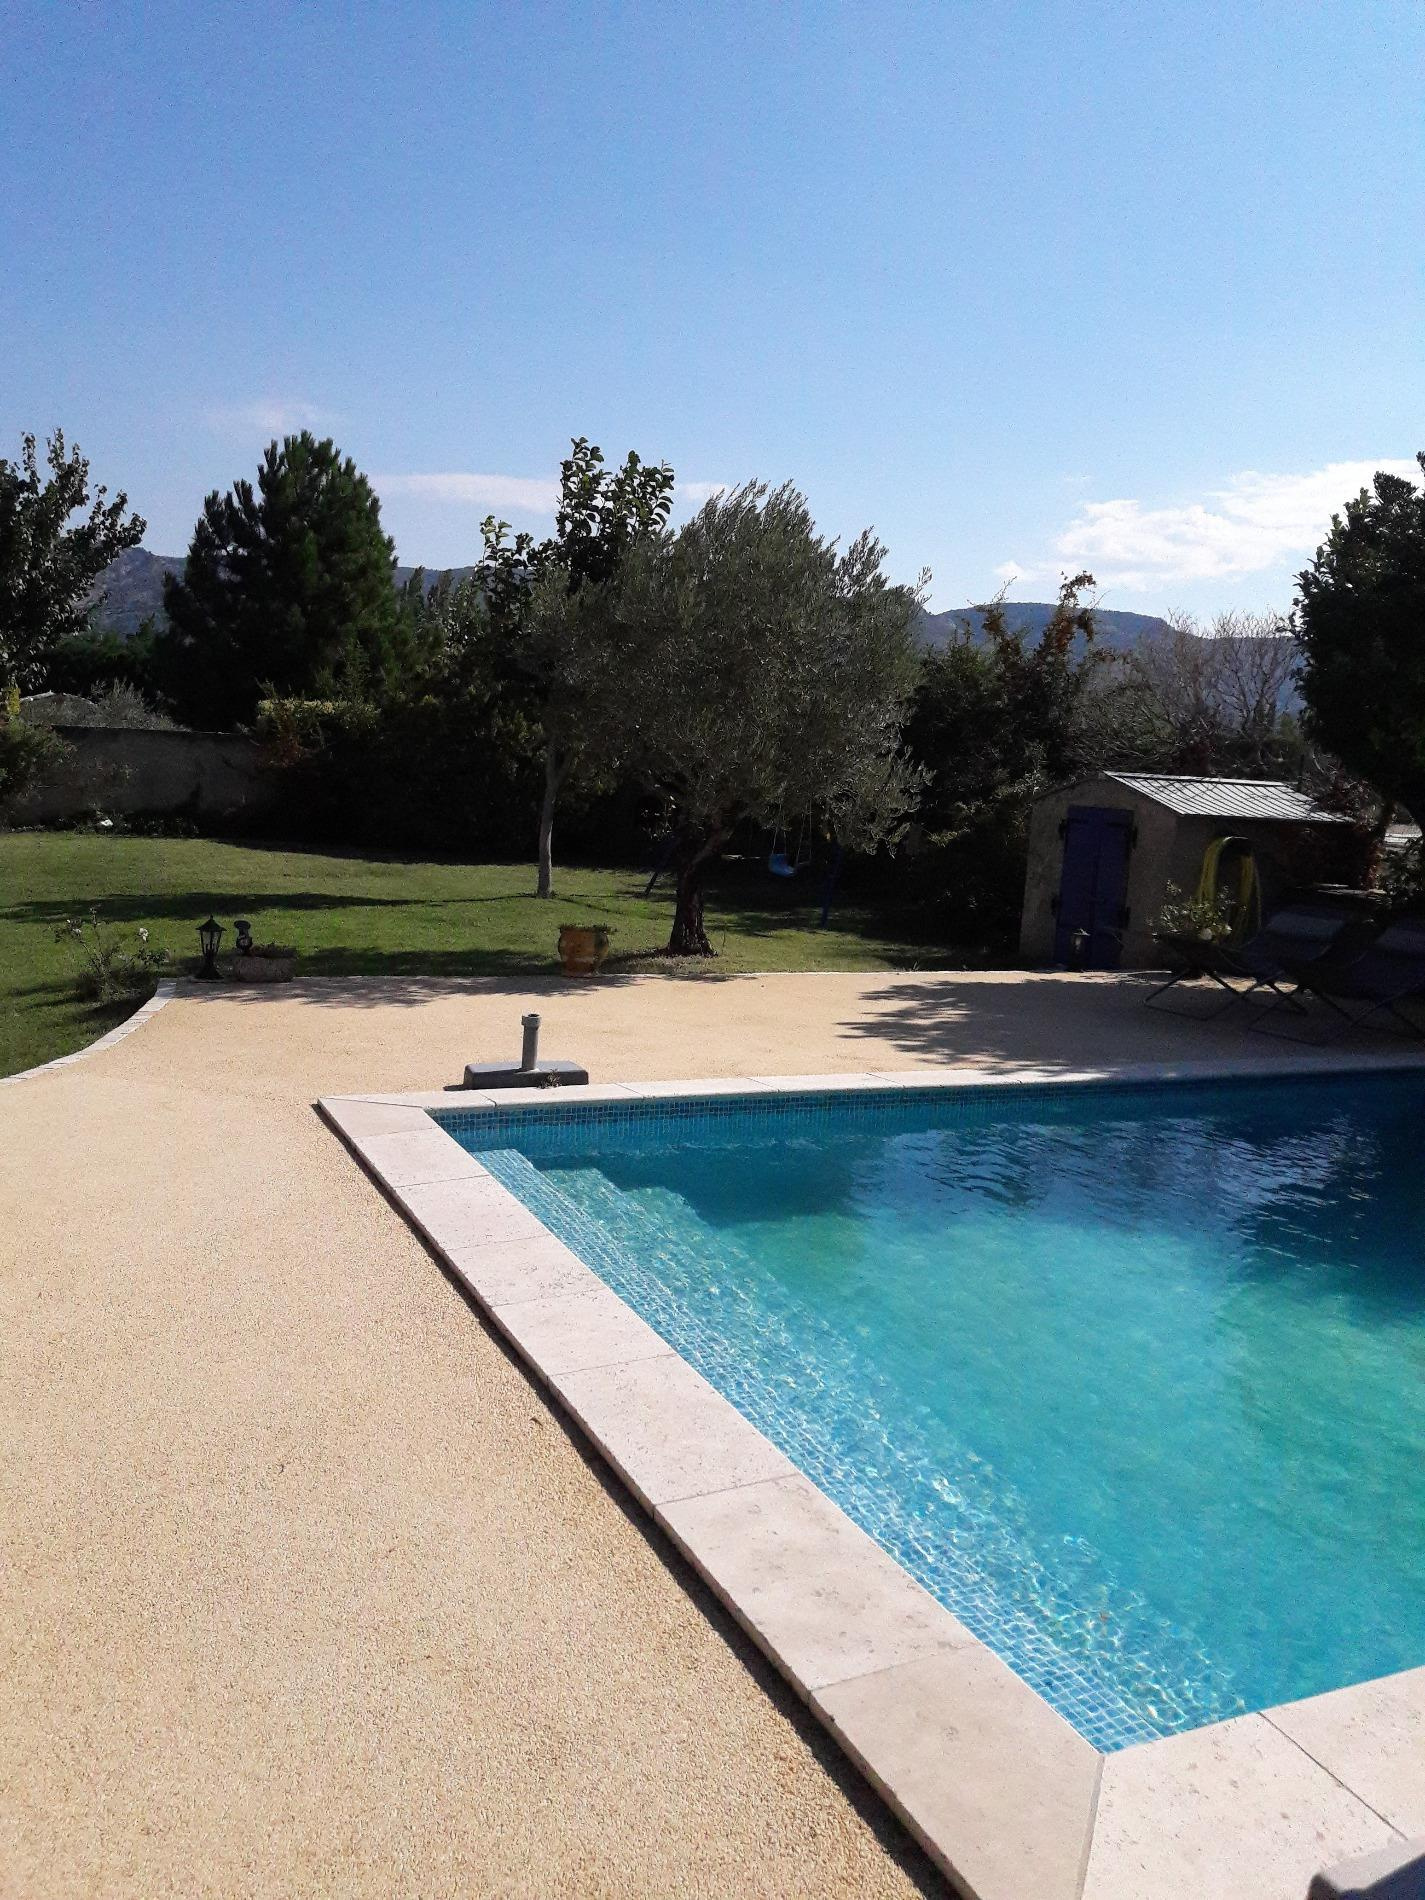 Maison avec piscine luberon ventana blog - Location maison avec piscine luberon ...